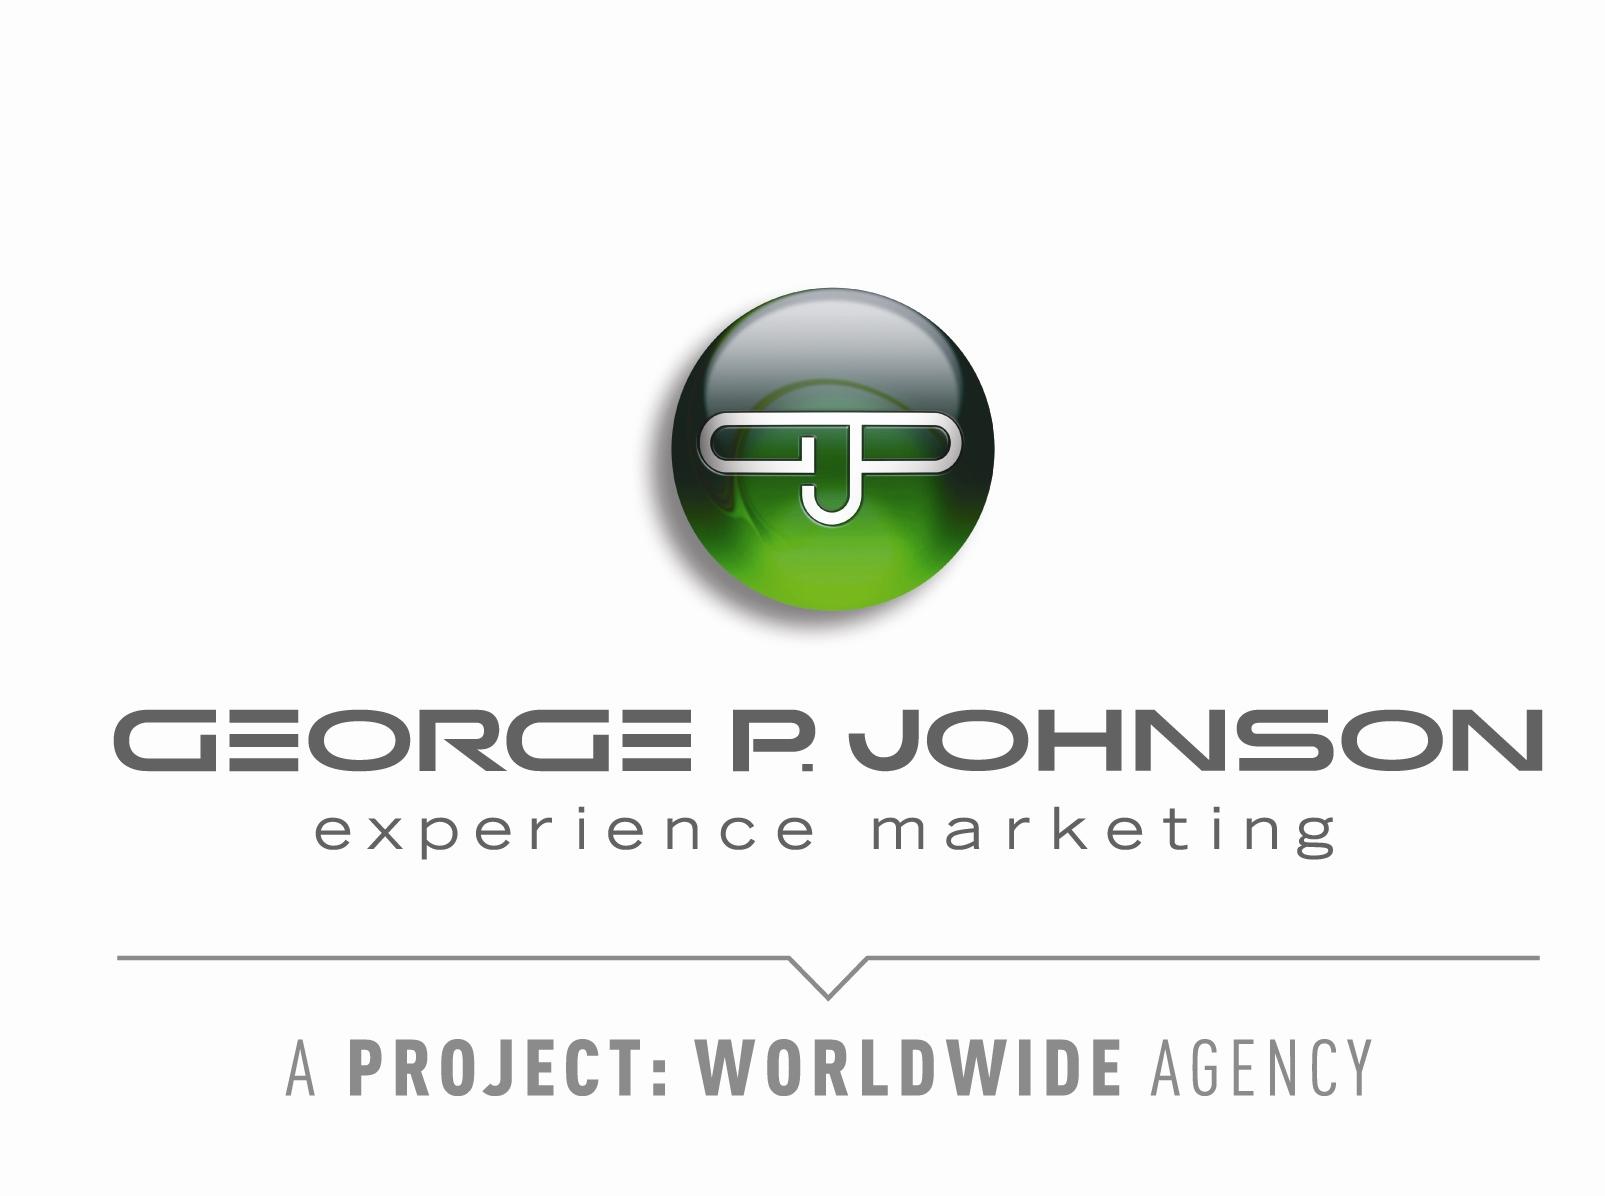 george p johnson